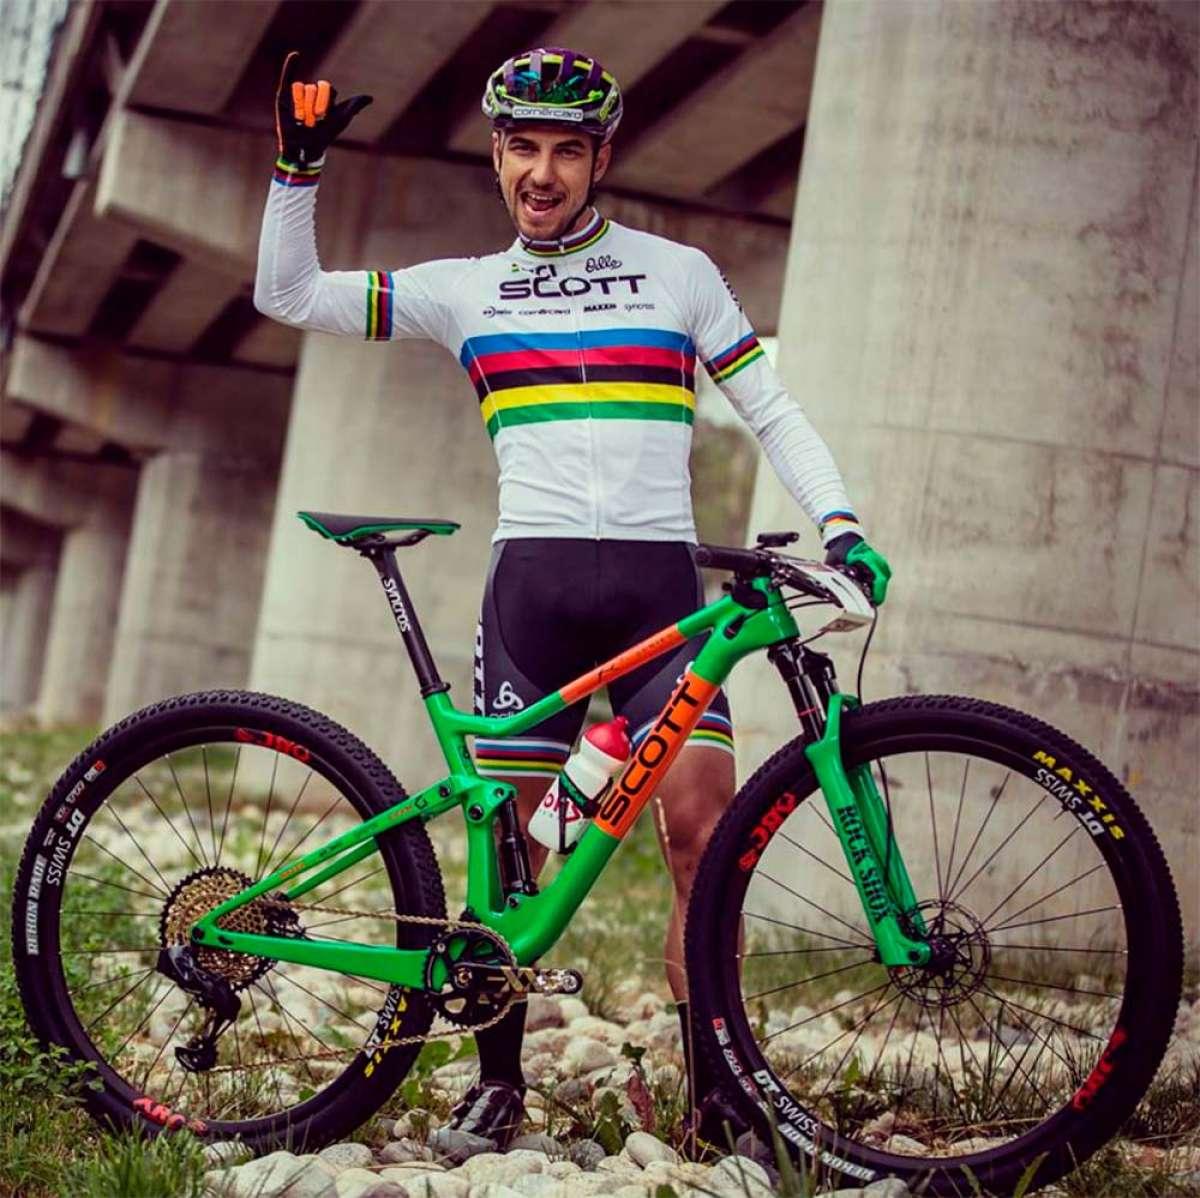 La Scott Spark personalizada de Nino Schurter para la Copa del Mundo XCO 2018 de Val di Sole